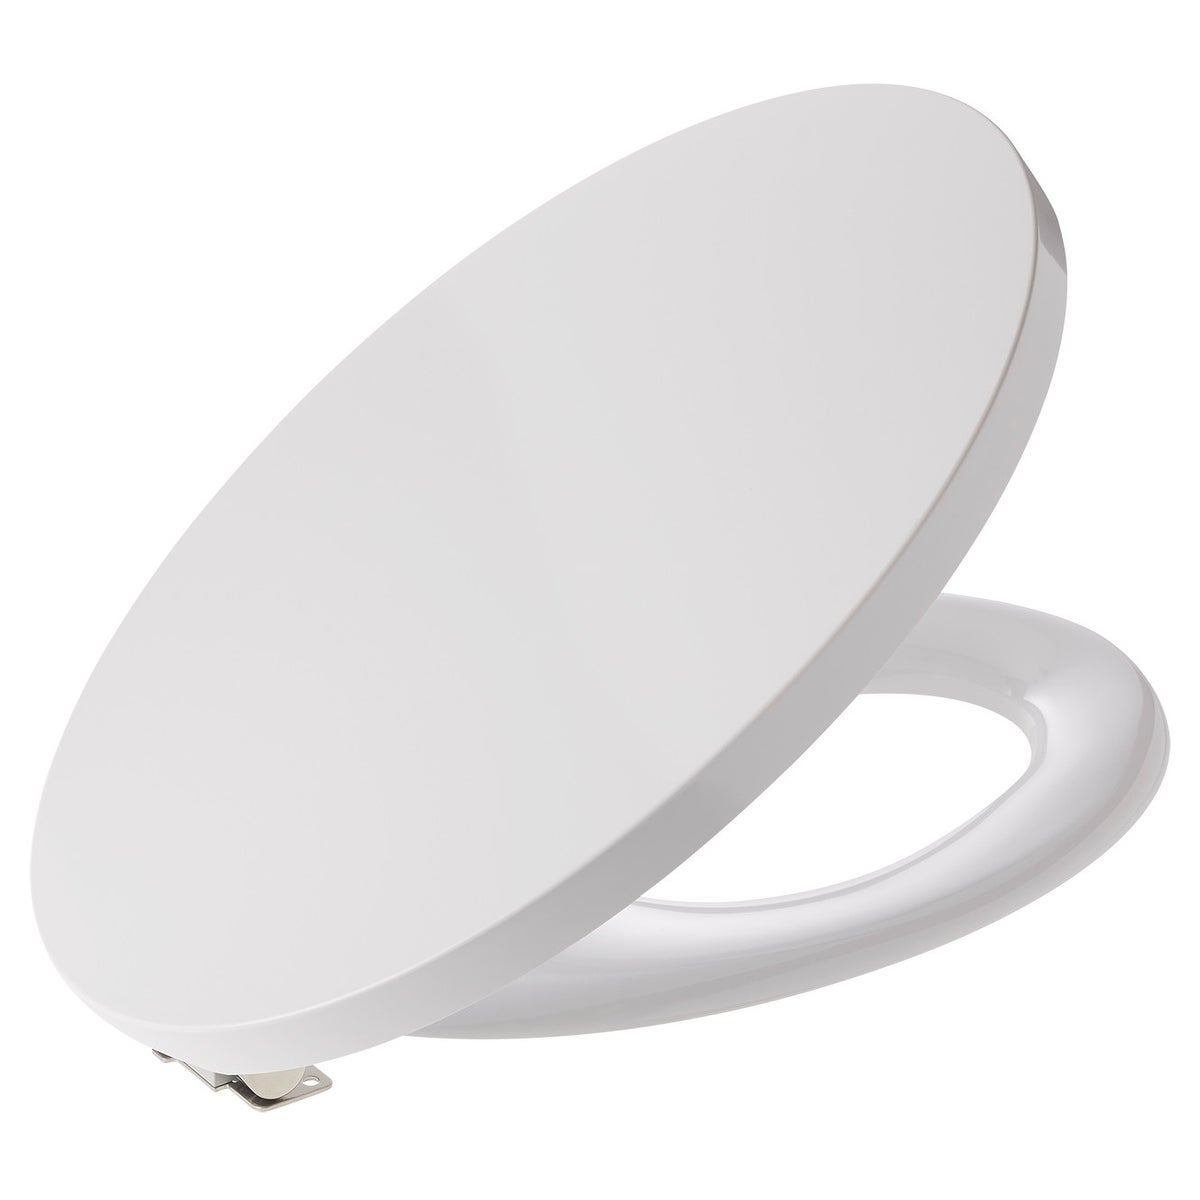 Fantastic Buy Kohler Toilet Seats Online At Overstock Our Best Creativecarmelina Interior Chair Design Creativecarmelinacom